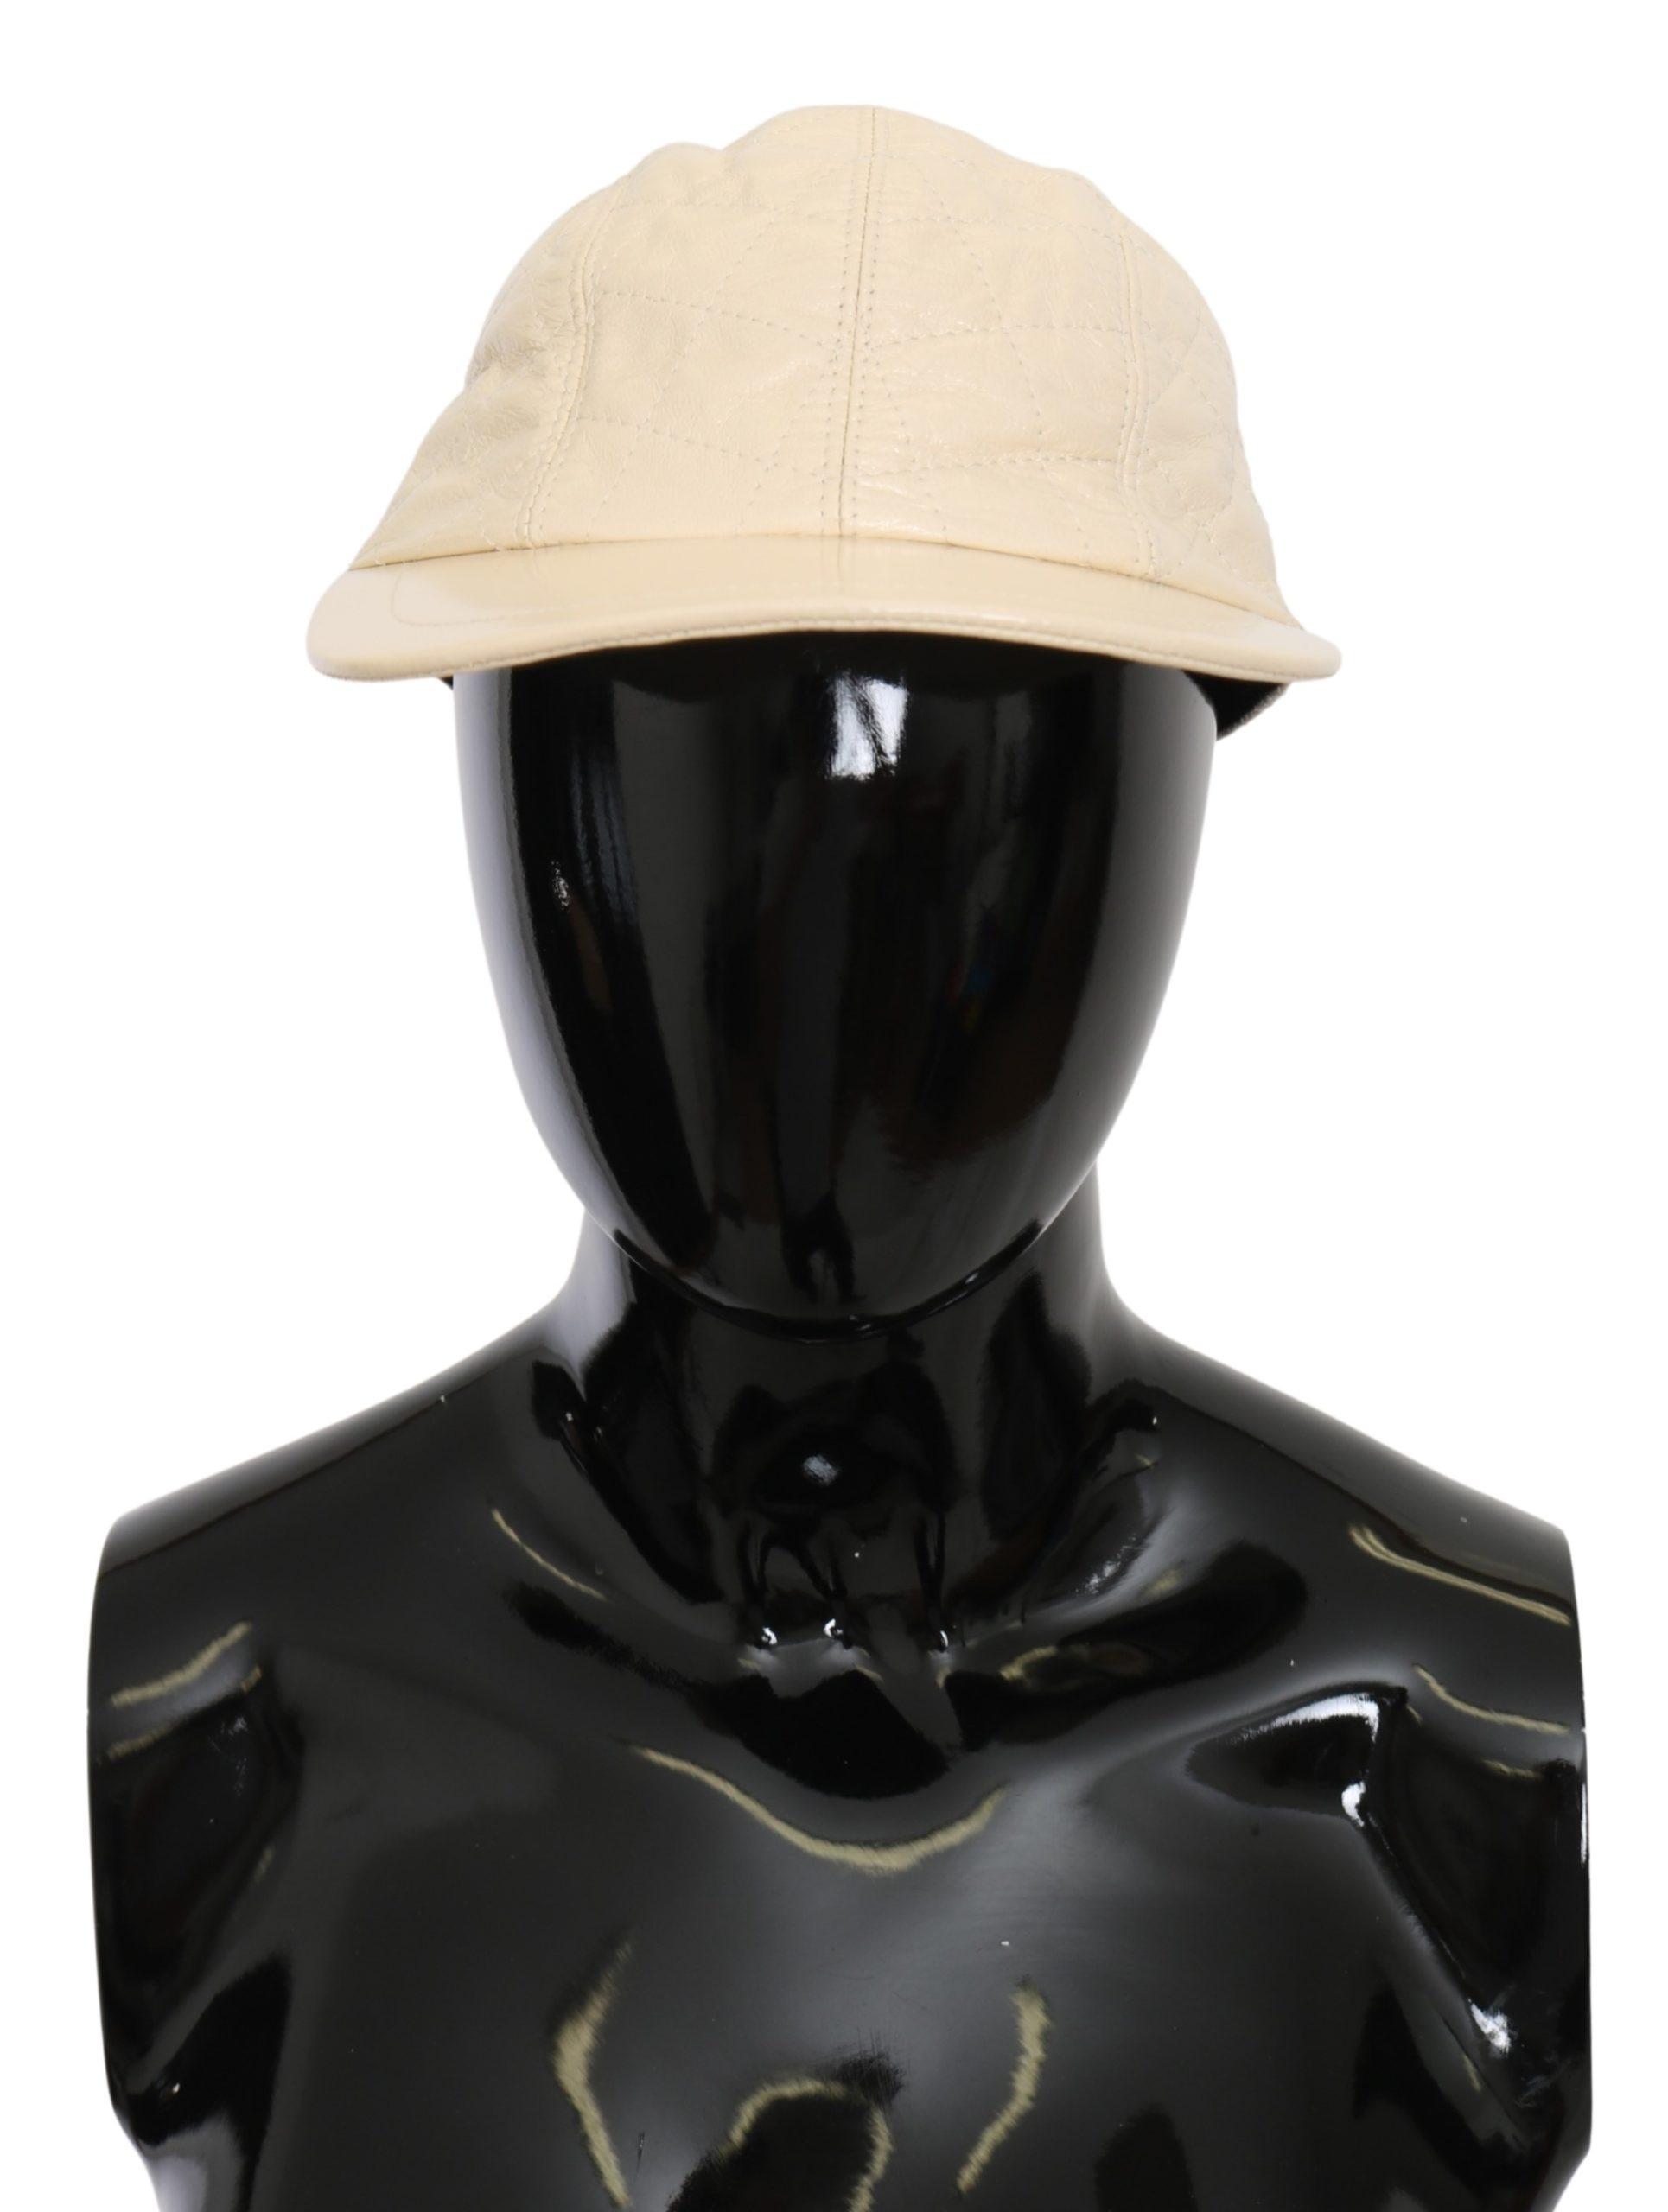 Dolce & Gabbana Men's Lamb Skin Leather Baseball Hat White HAT9098 - 57 cm|S